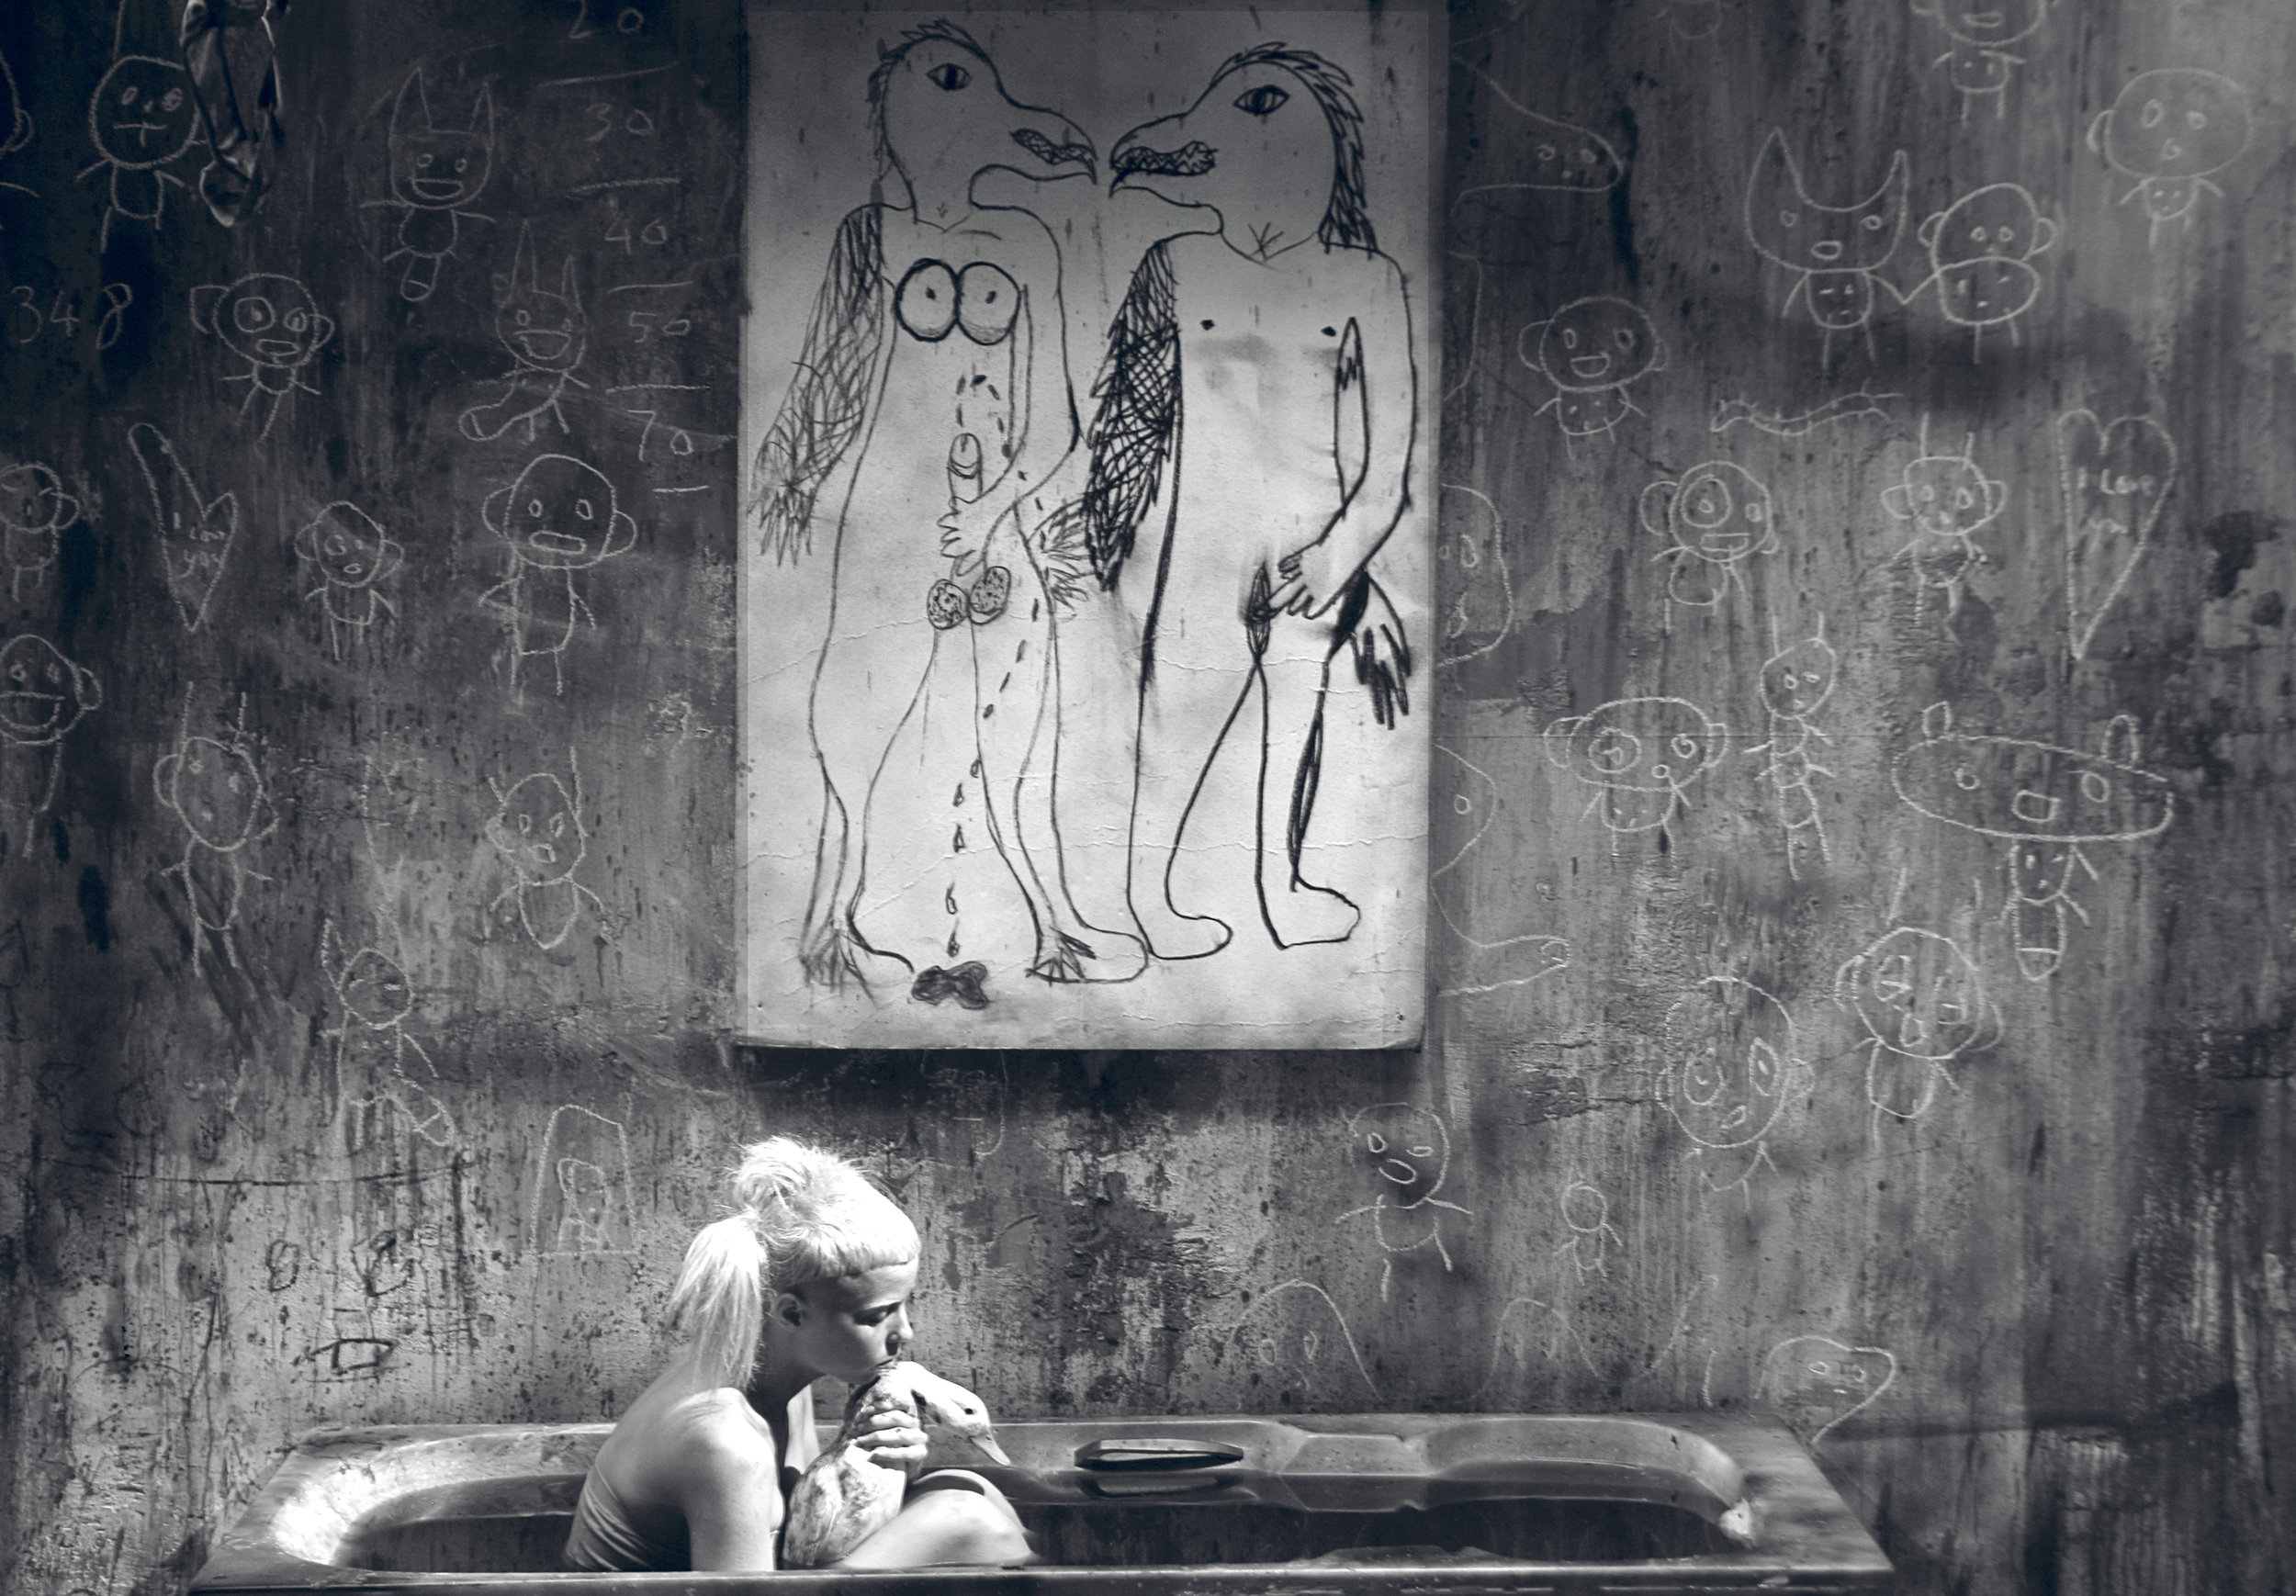 BATH SCENE (2012). CREDIT: ROGER BALLEN